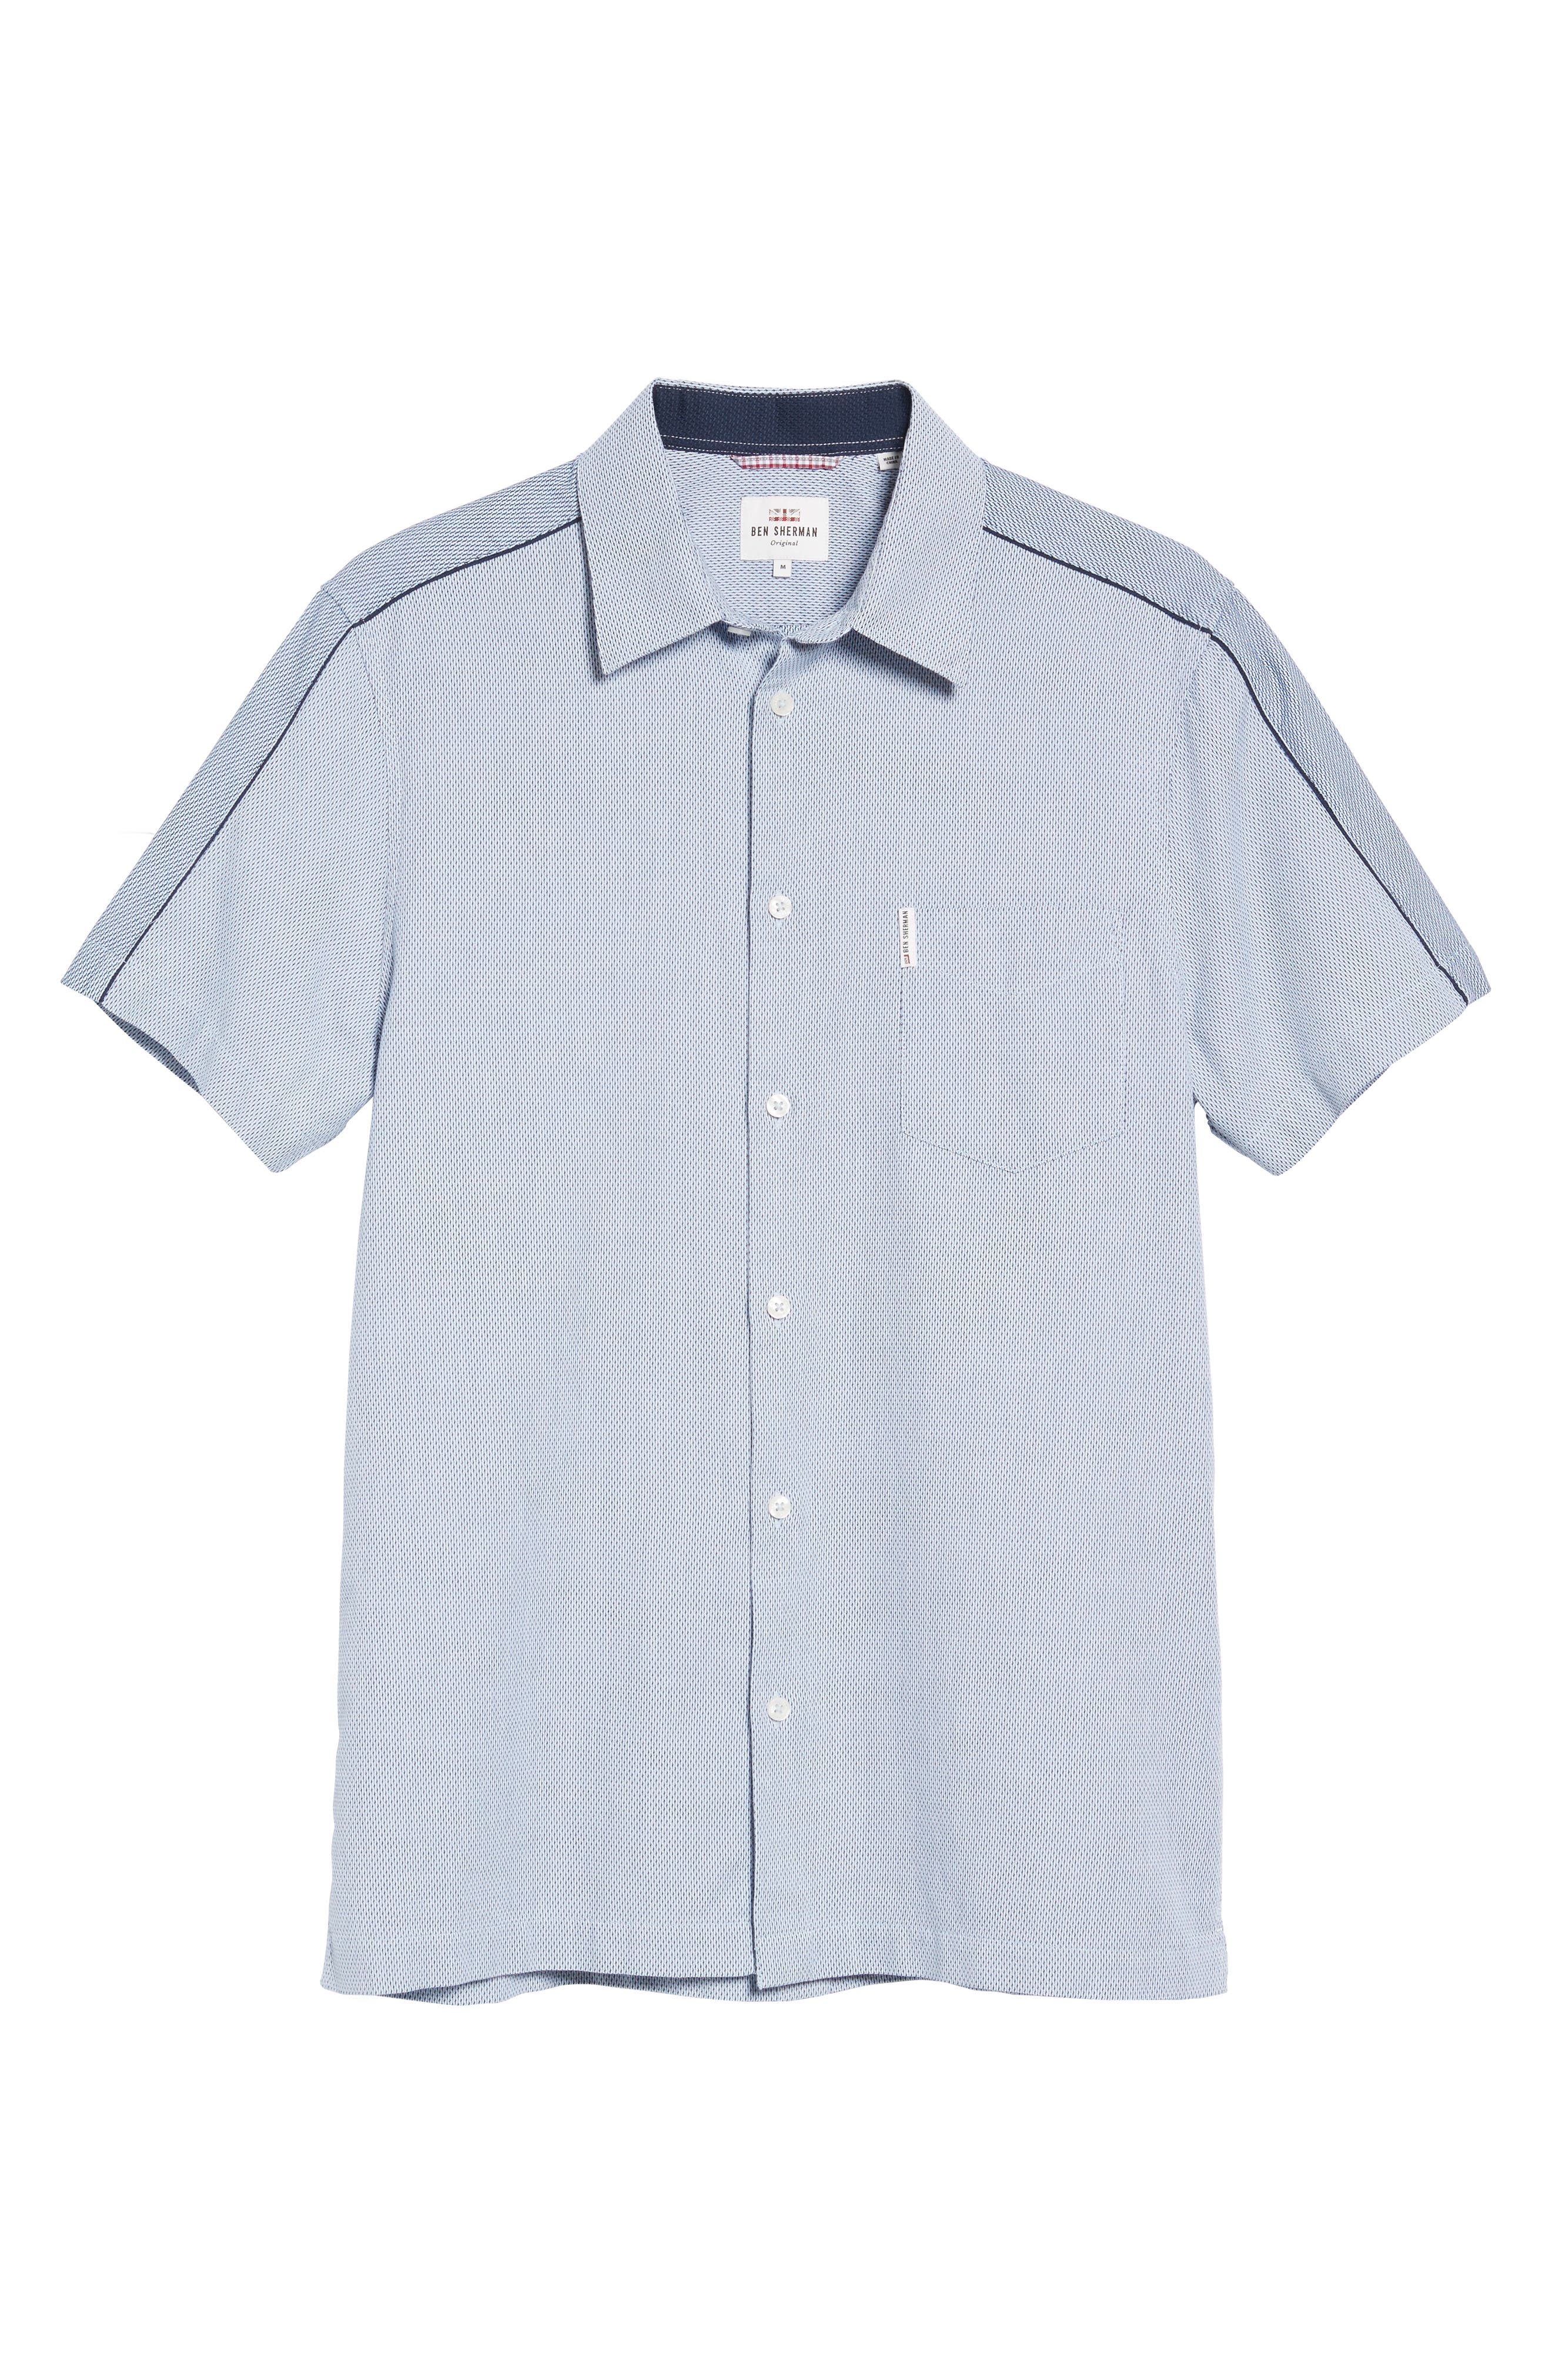 Dobby Short Sleeve Shirt,                             Alternate thumbnail 6, color,                             450